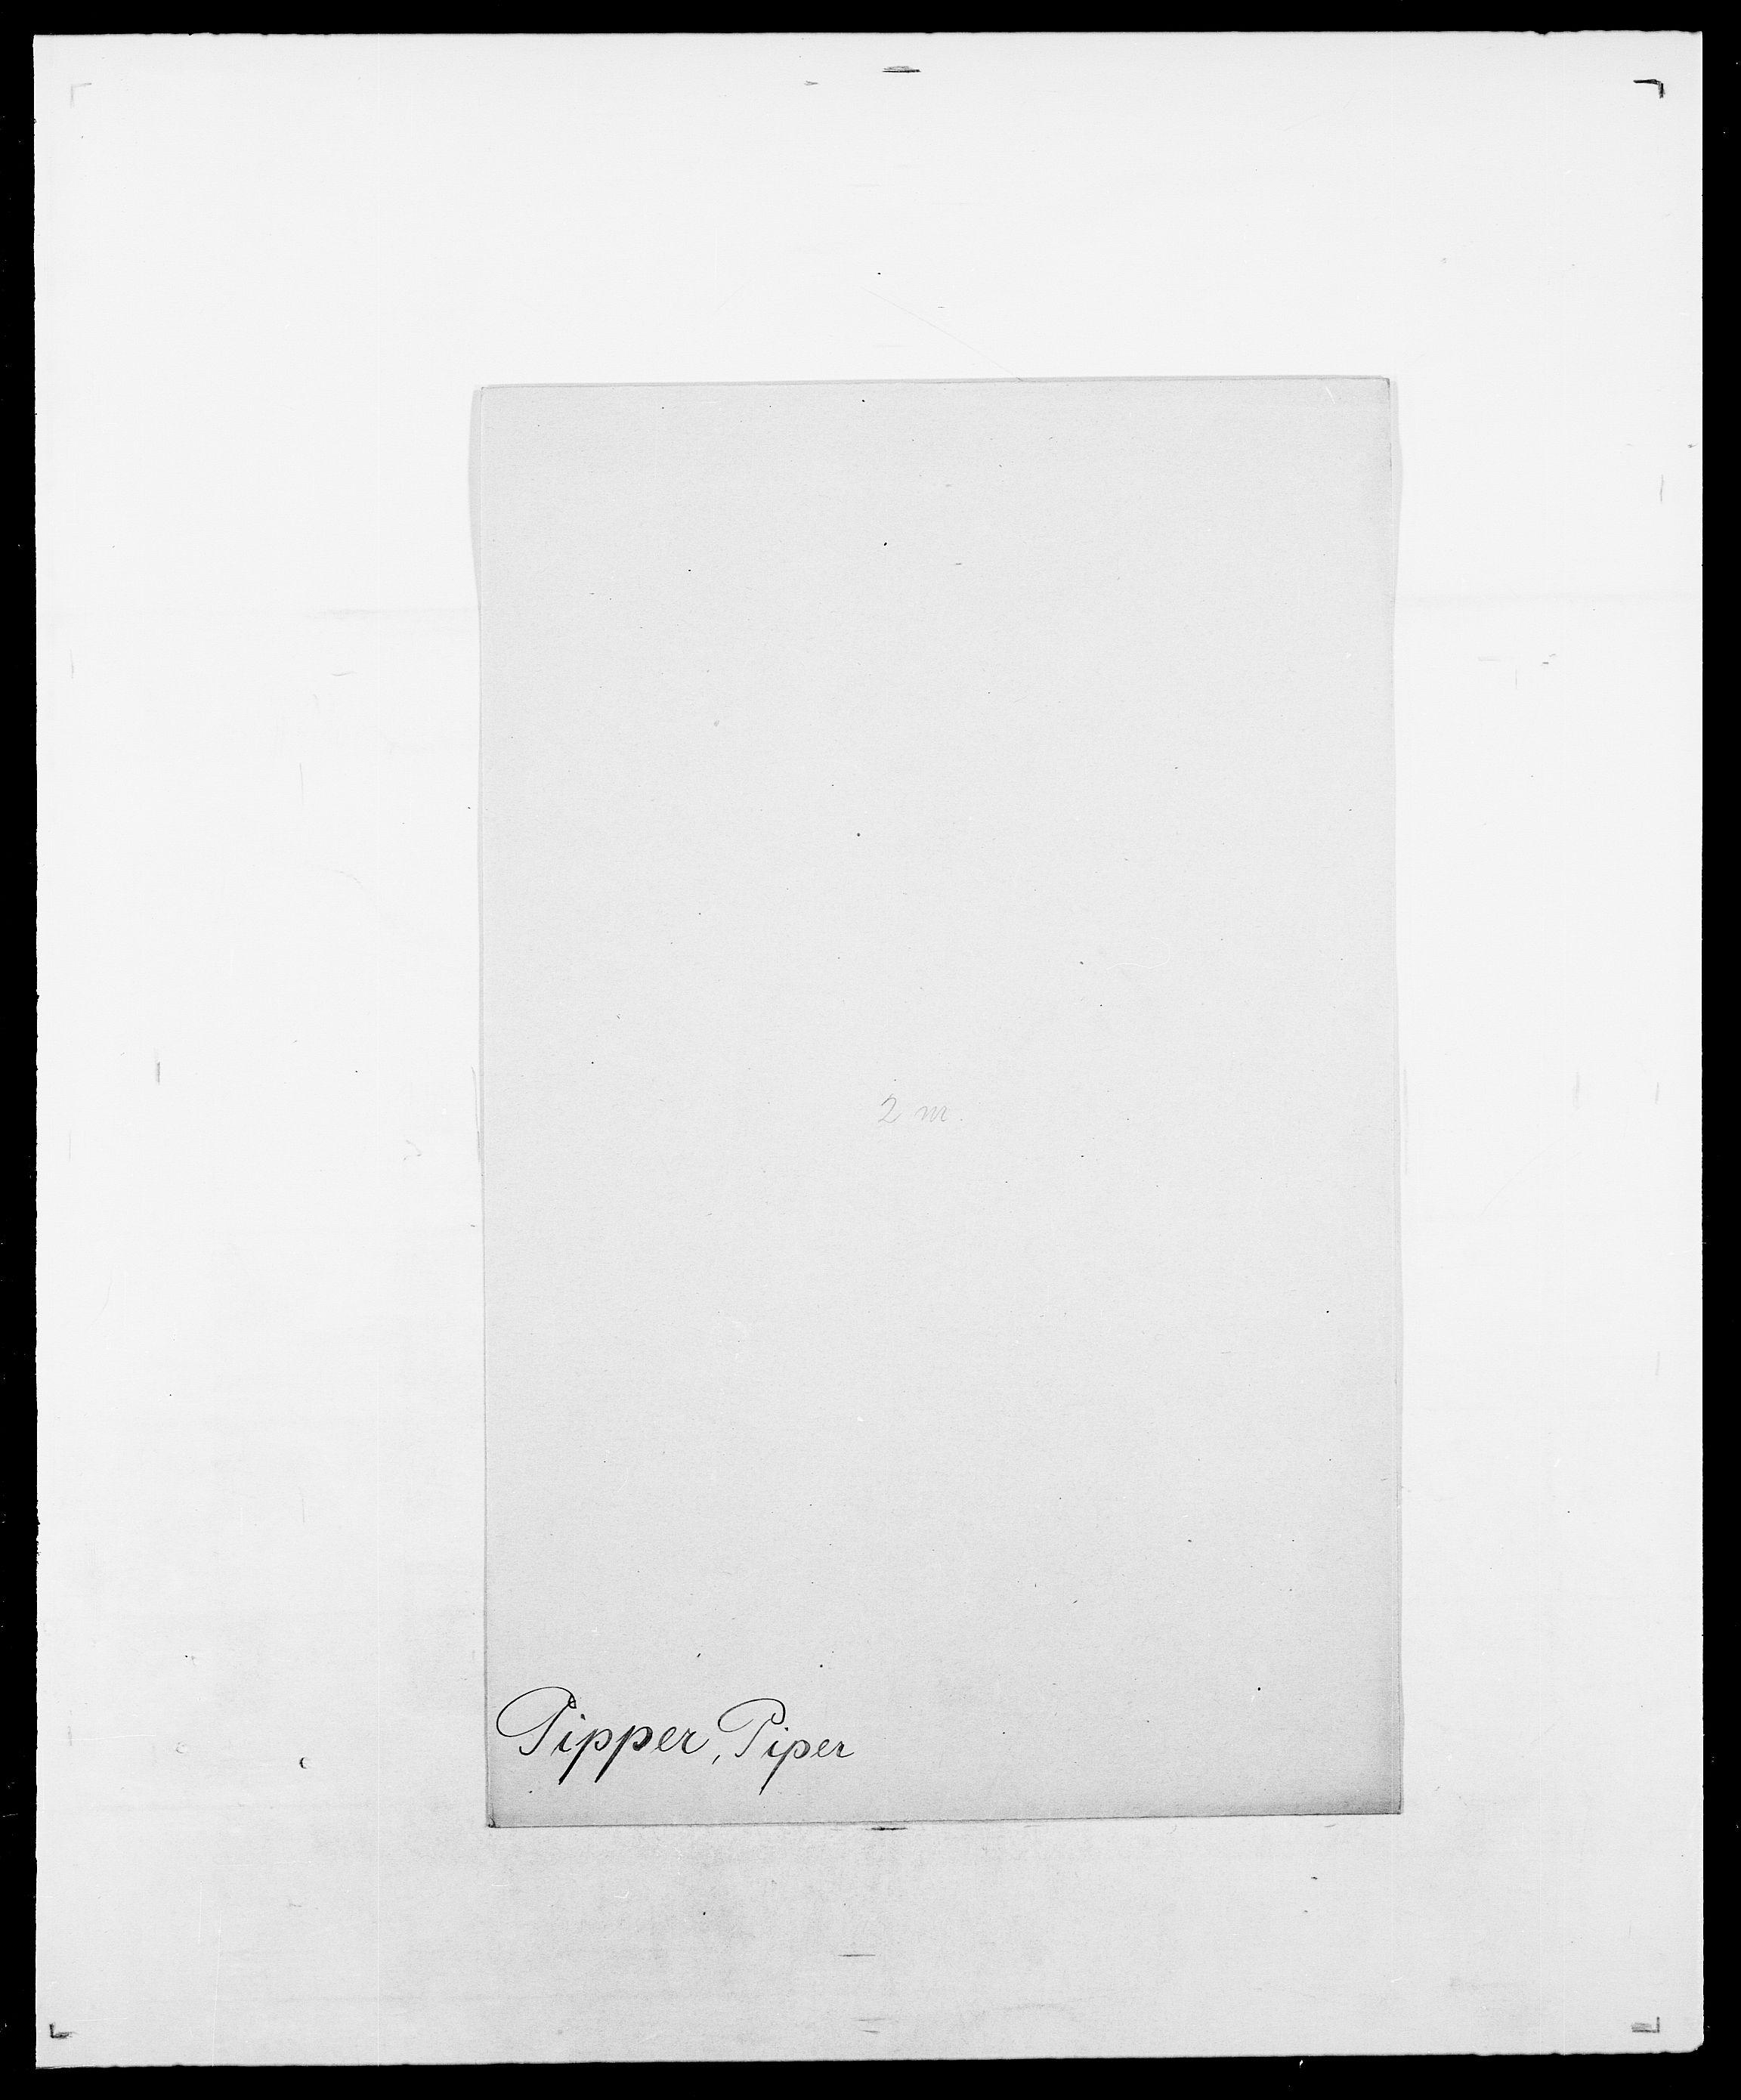 SAO, Delgobe, Charles Antoine - samling, D/Da/L0030: Paars - Pittelkov, s. 561